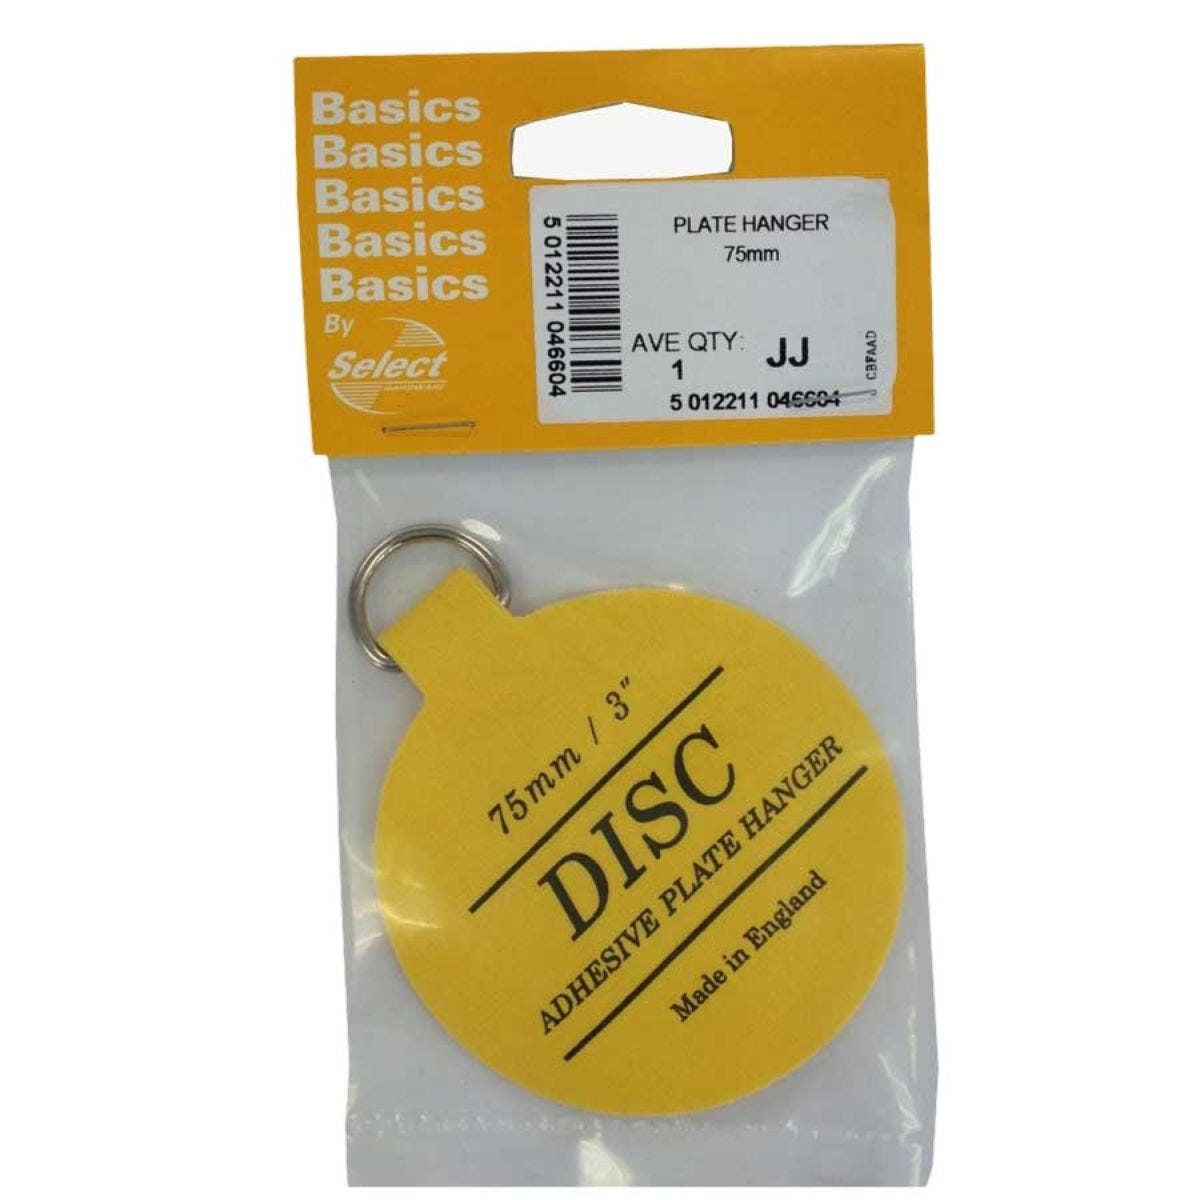 Select Hardware Disc Plate Hanger 75mm (1 Pack)